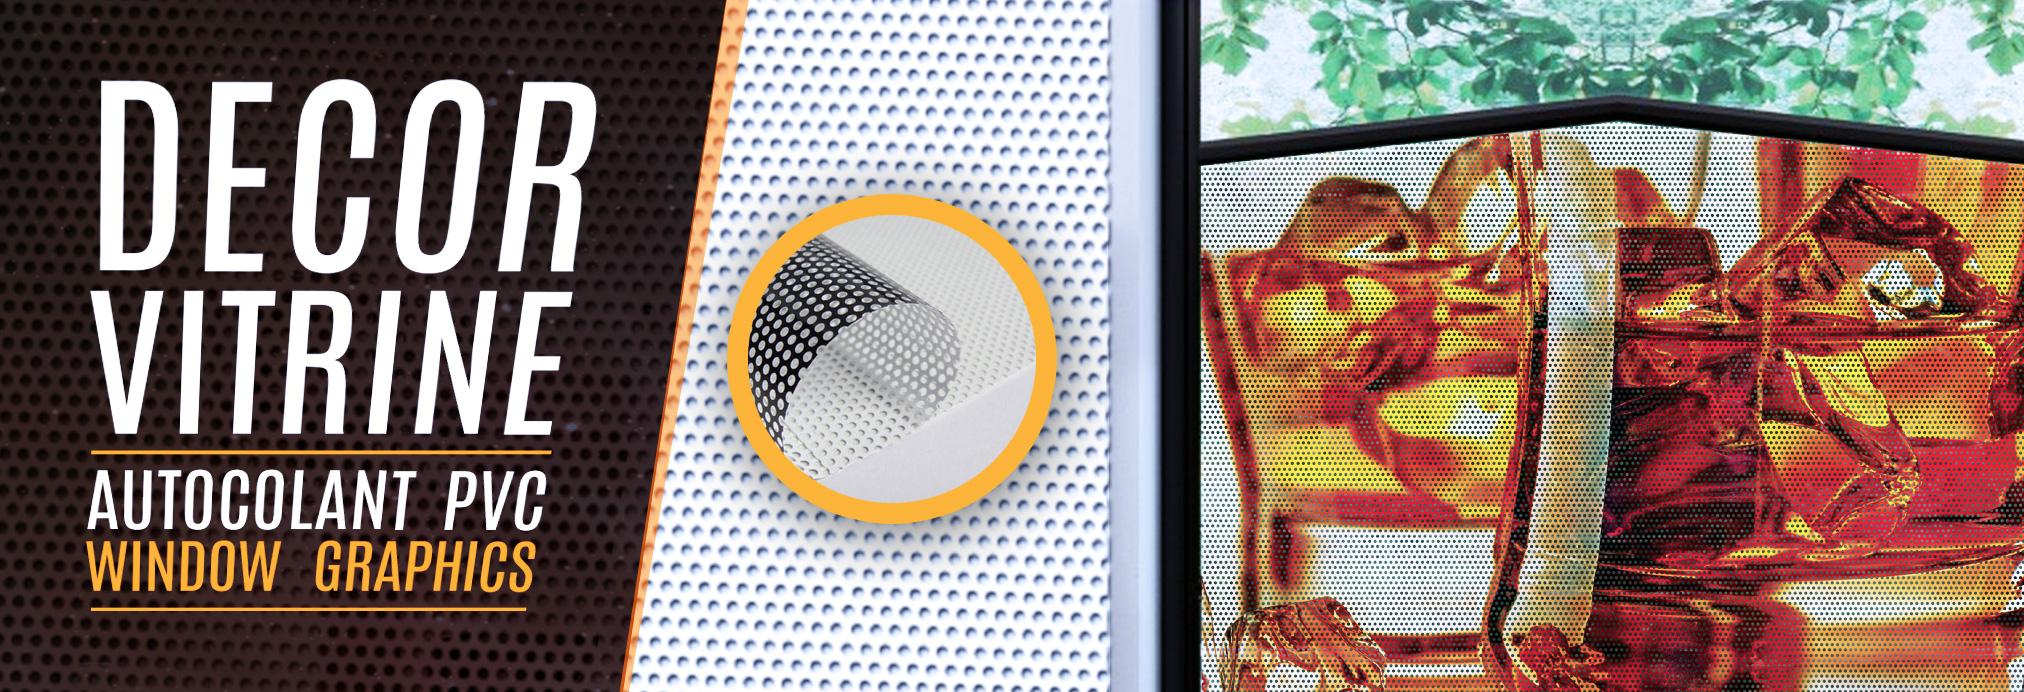 Window graphics decor vitrine